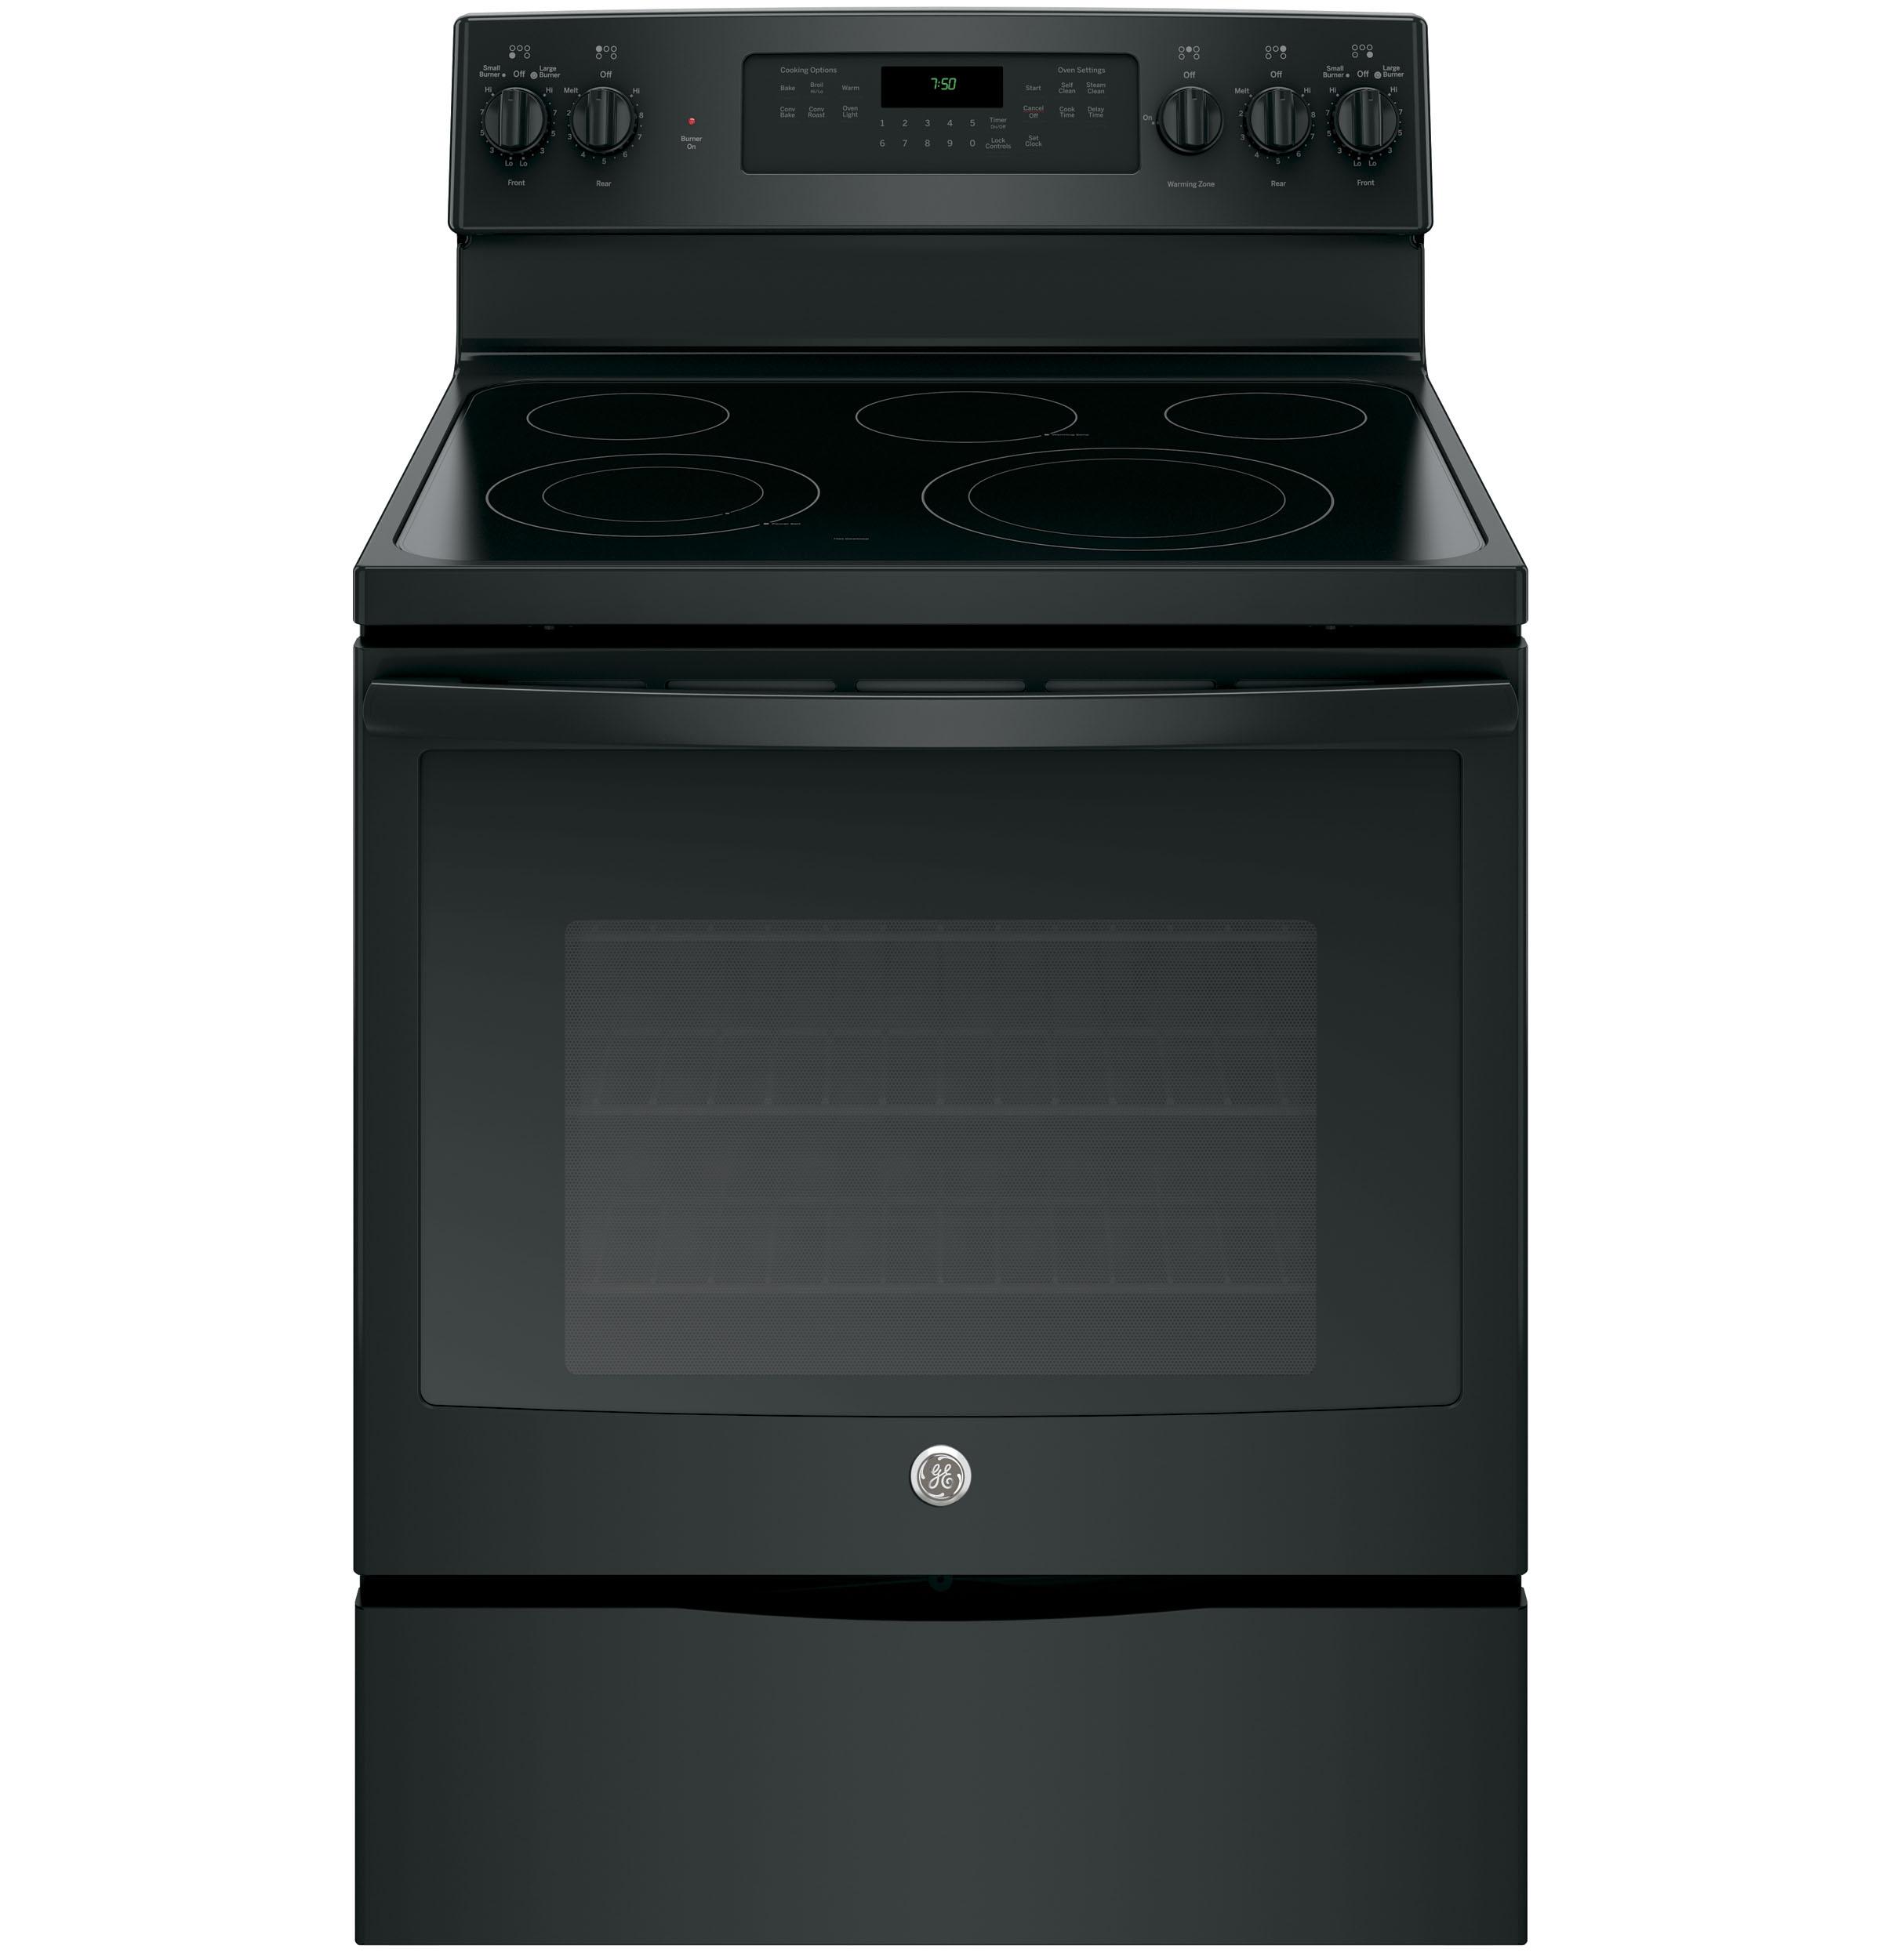 "GE Appliances GE Electric Ranges 30"" Electric Convection Range - Item Number: JB750DJBB"